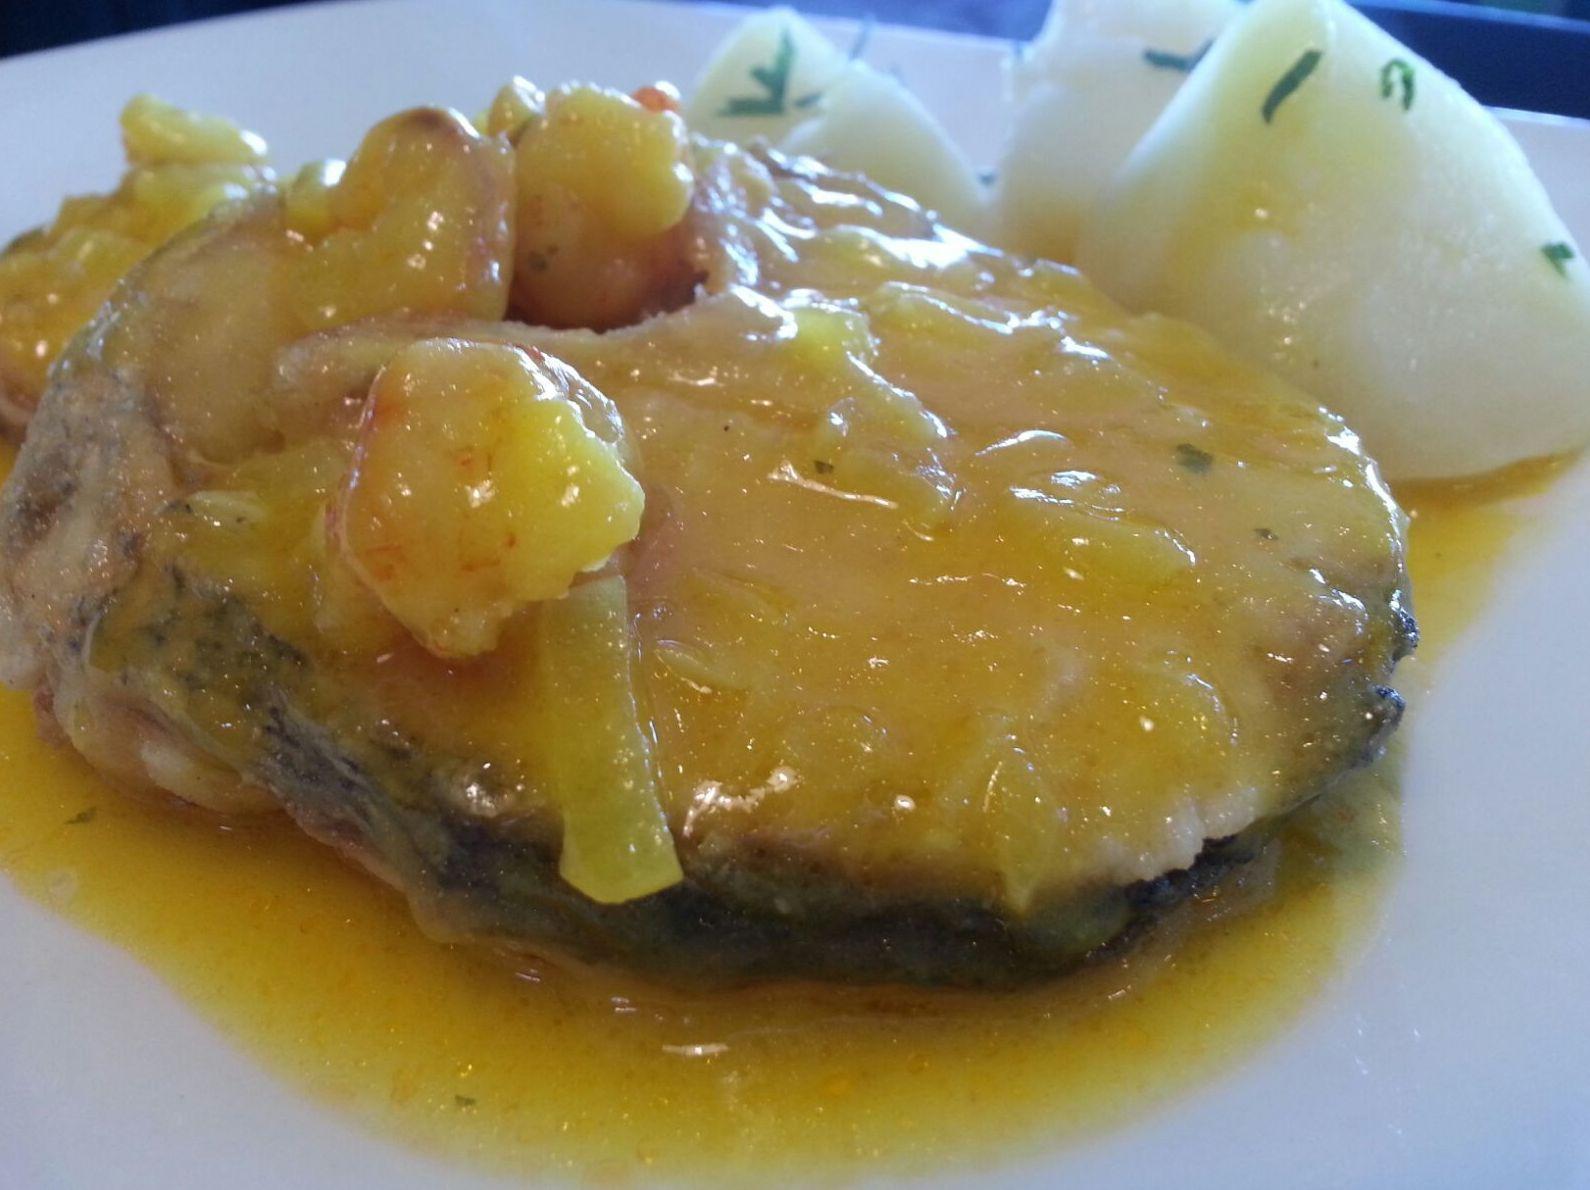 Foto 97 de Cocina tradicional en Madrid | Bar Restaurante Doña Elena